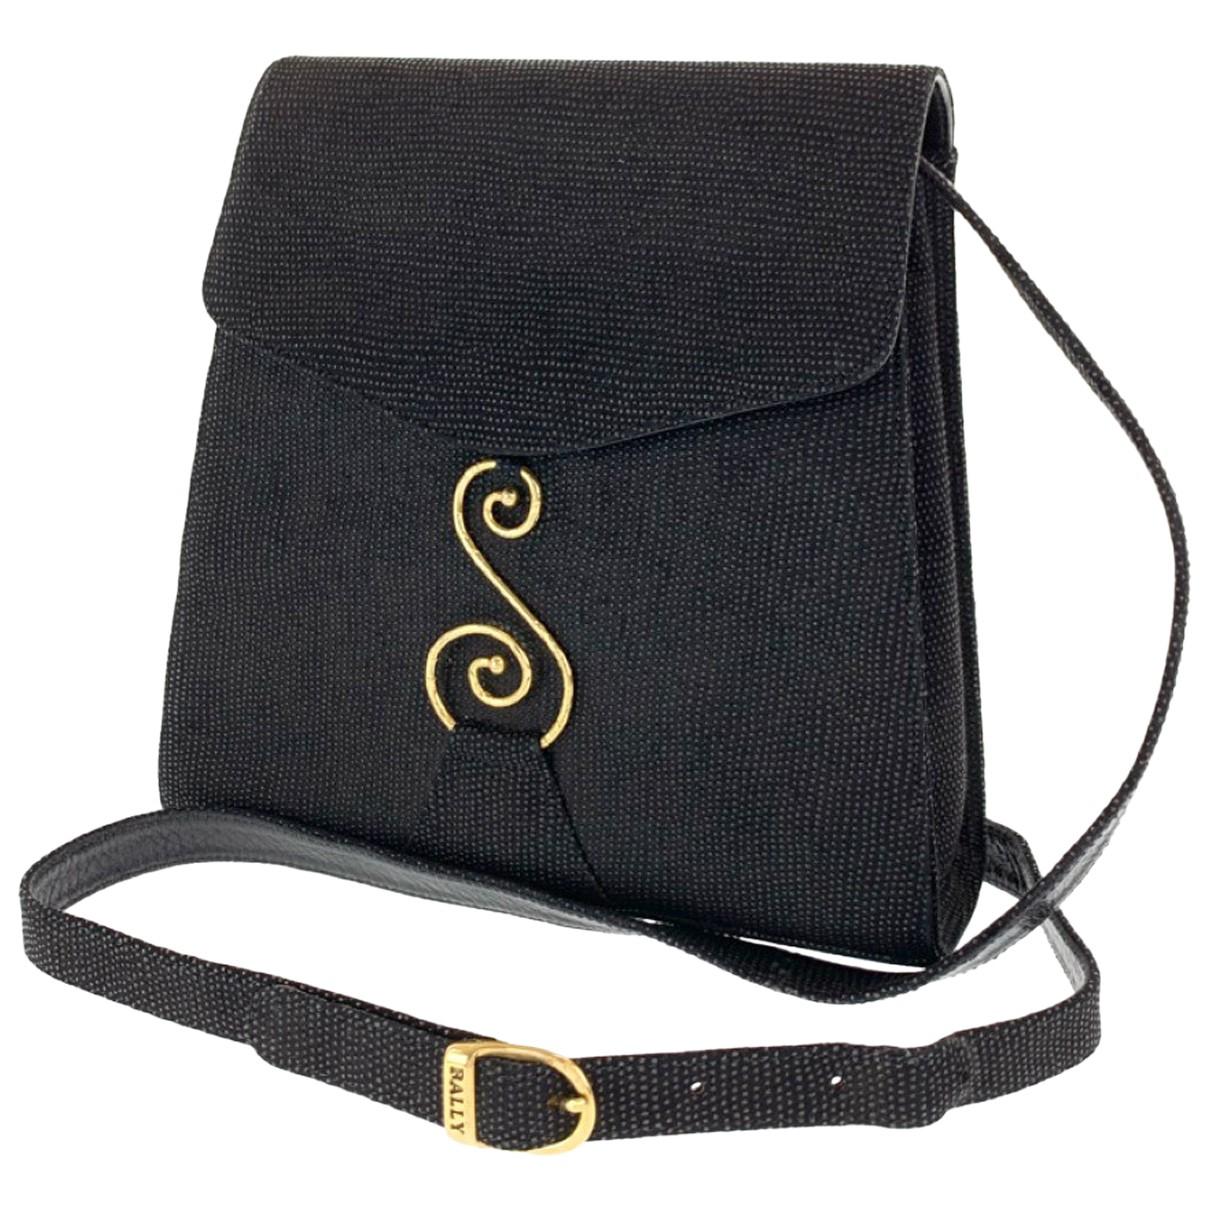 Bally N Cloth handbag for Women N